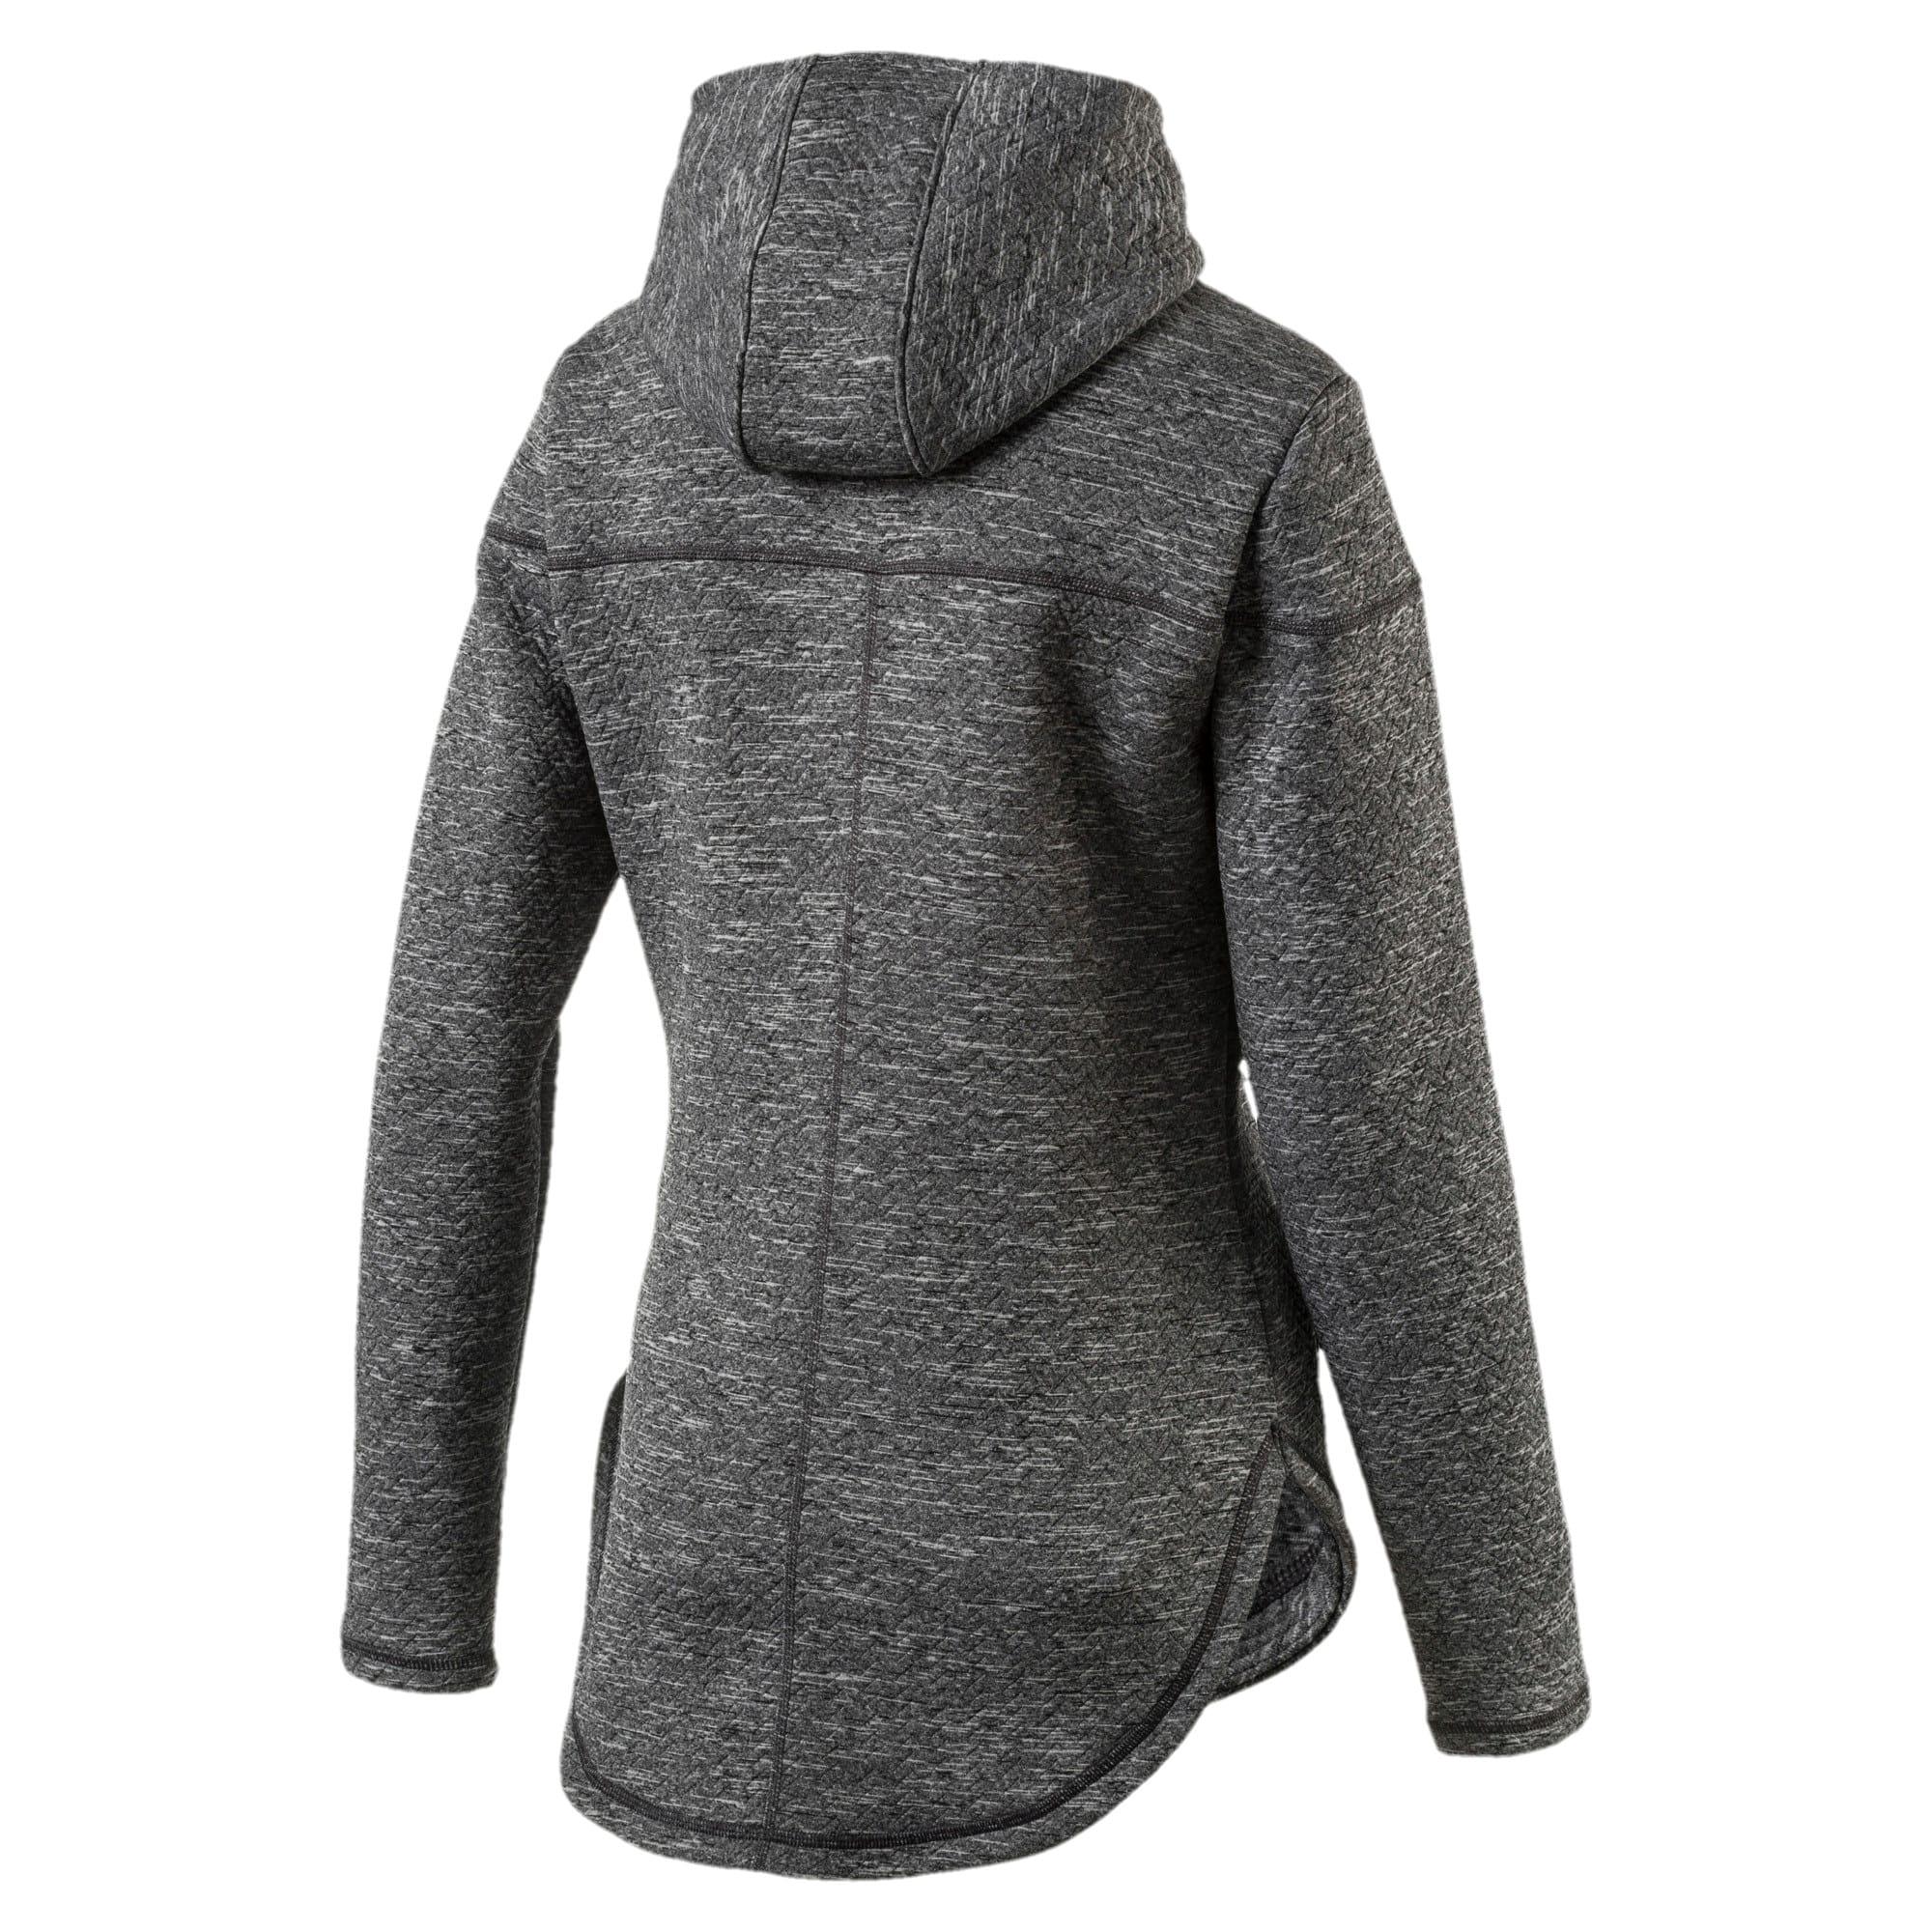 Thumbnail 5 of Active Training Women's Nocturnal Winterized Jacket, Dark Gray Heather, medium-IND